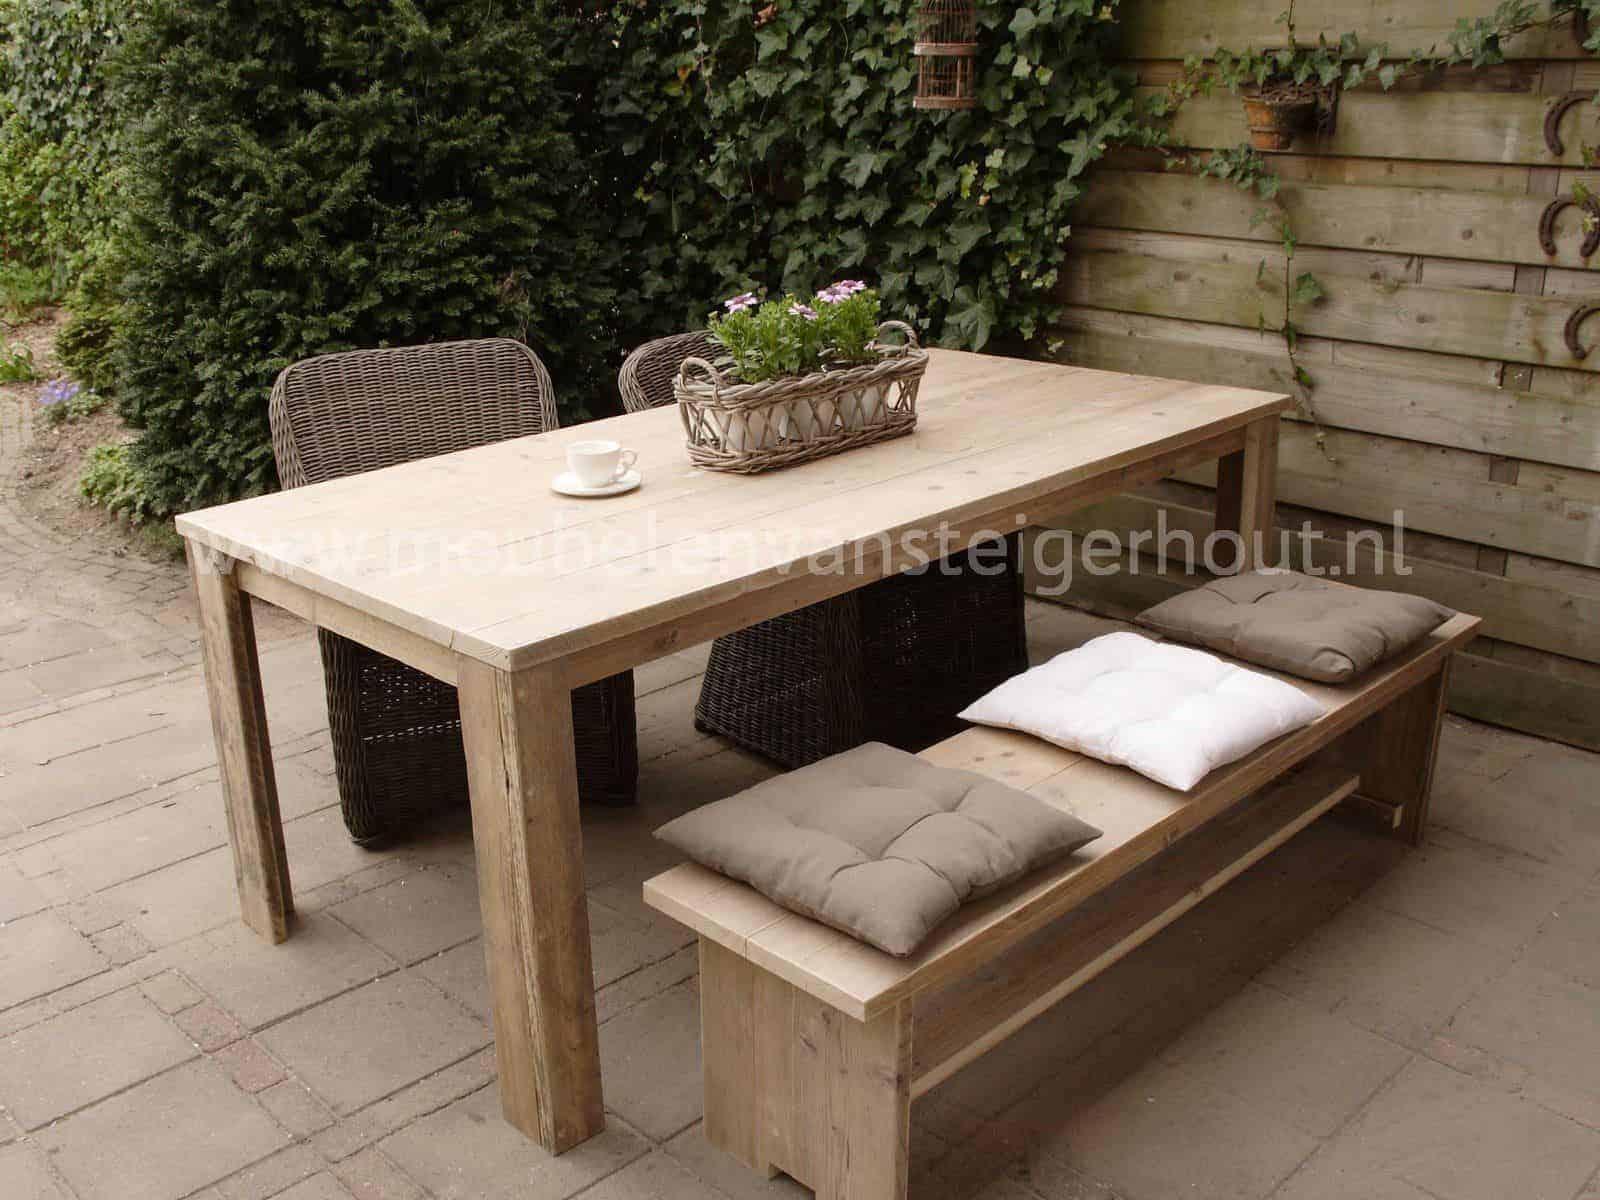 Tuintafel standaard meubelen van steigerhout for Tuintafel steigerhout bouwpakket